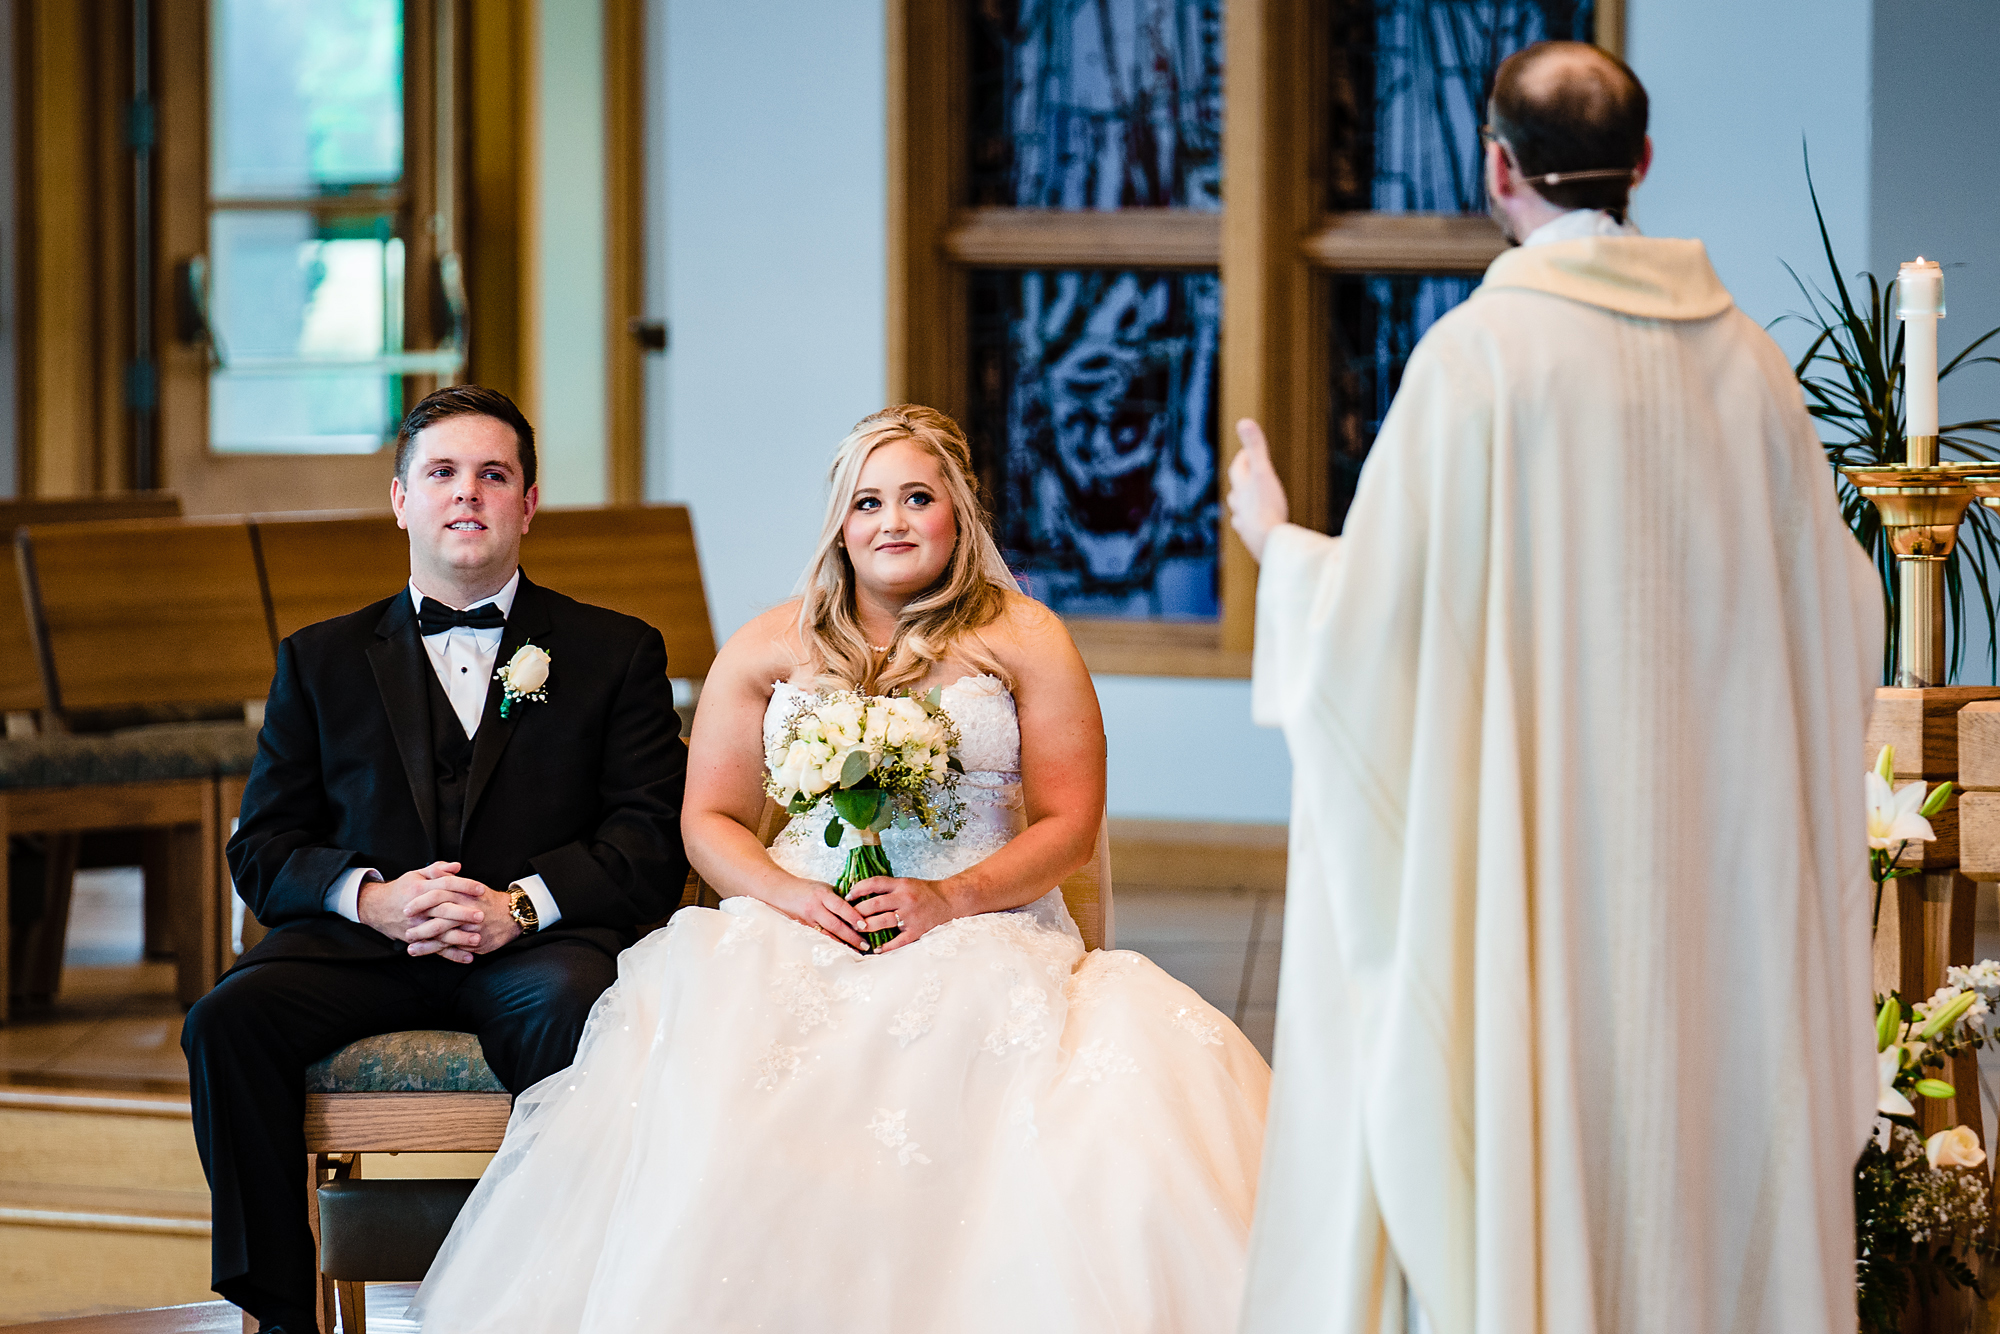 St-Susanna-Church-Mason-OH-Wedding-Photographer-13.jpg